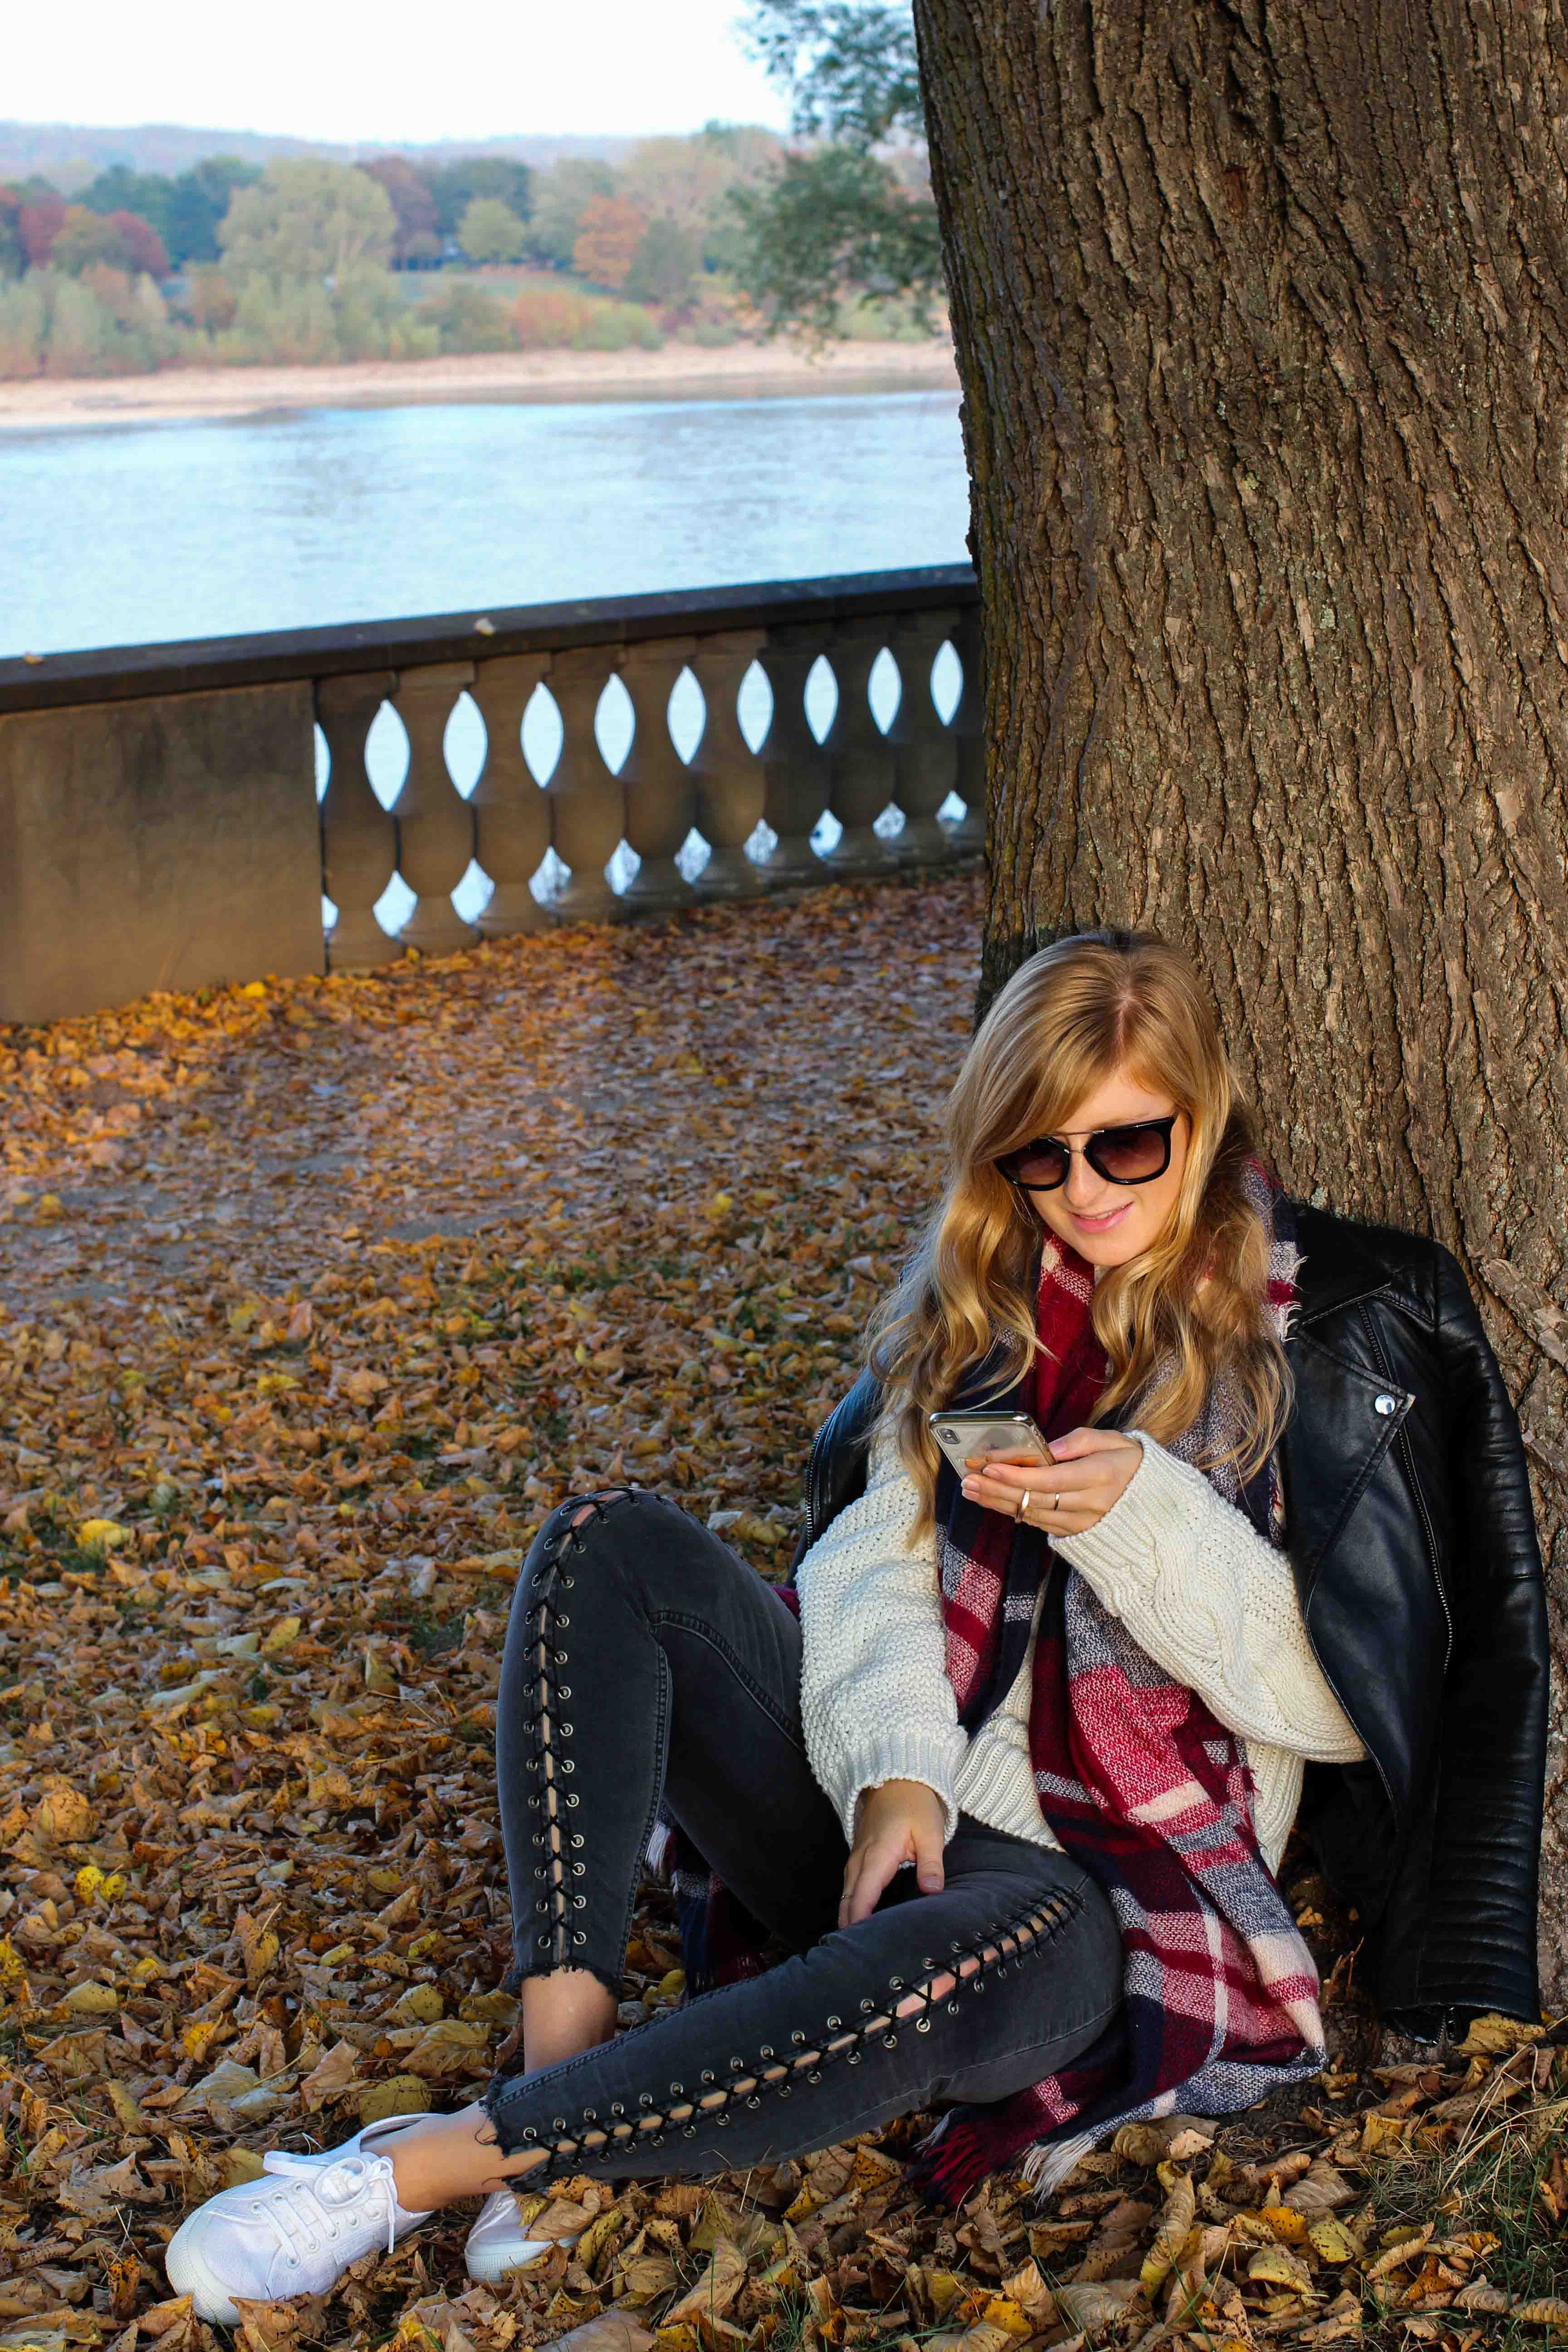 schönste Outfitfotos Herbst Foto Herbstbilder Karo Schal Herbst Must Have Trends 2019 Herbstoutfit